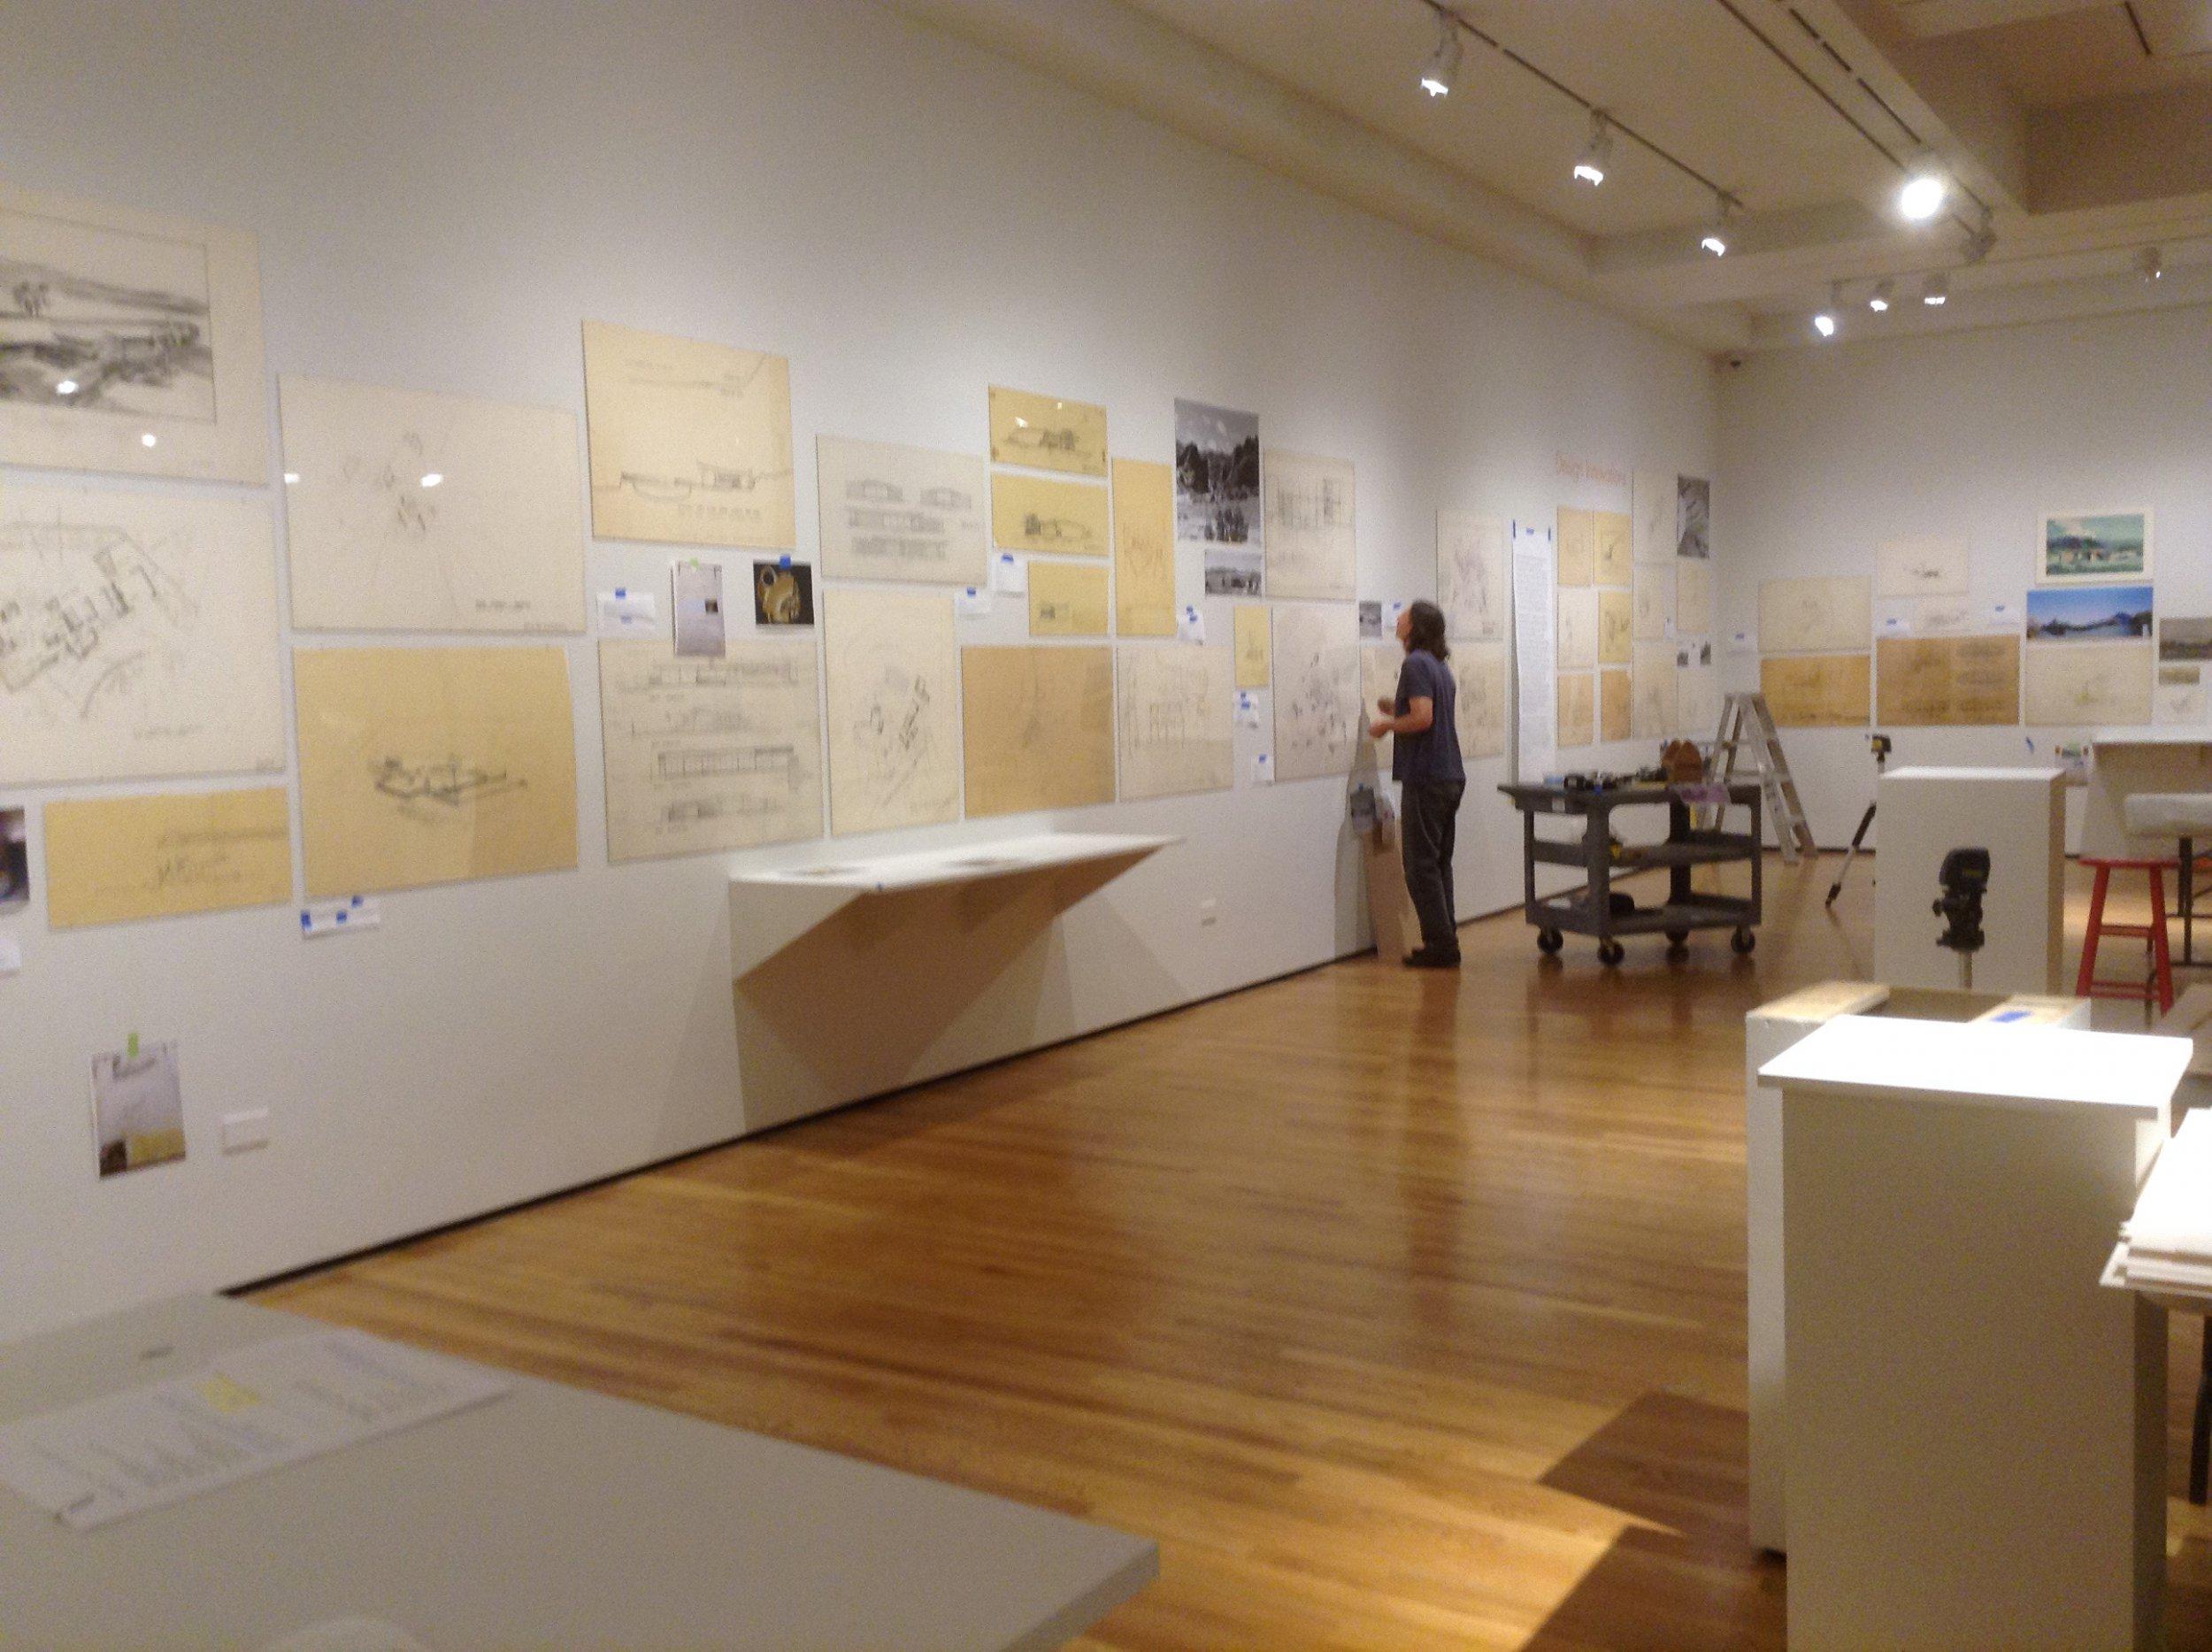 D Exhibition Designer Job In : An insider look at exhibition design art museum uc